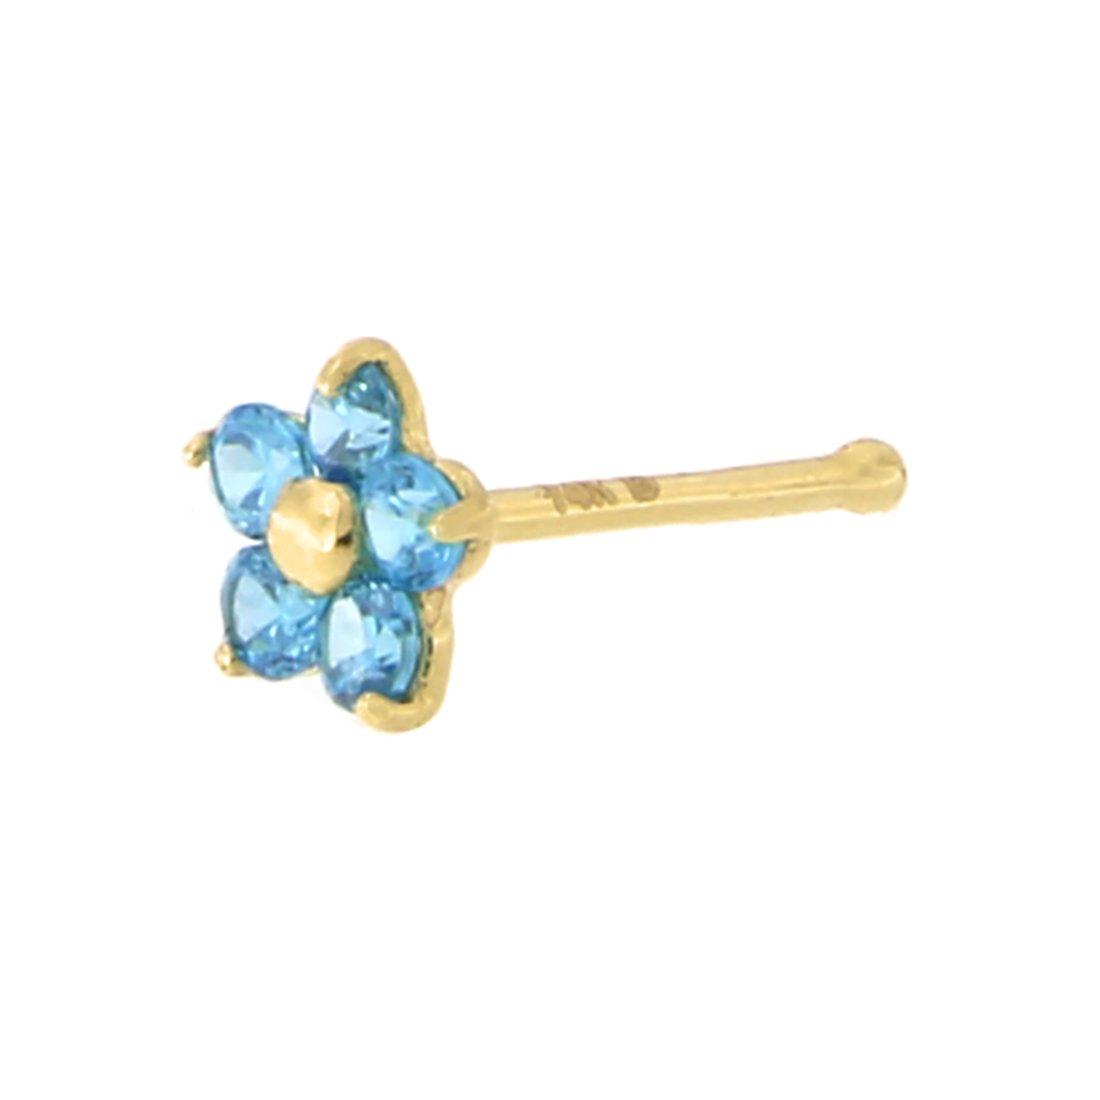 14k Yellow Gold Simulated Blue Topaz December Birthstone Flower Nose Stud Ring 20 Gauge